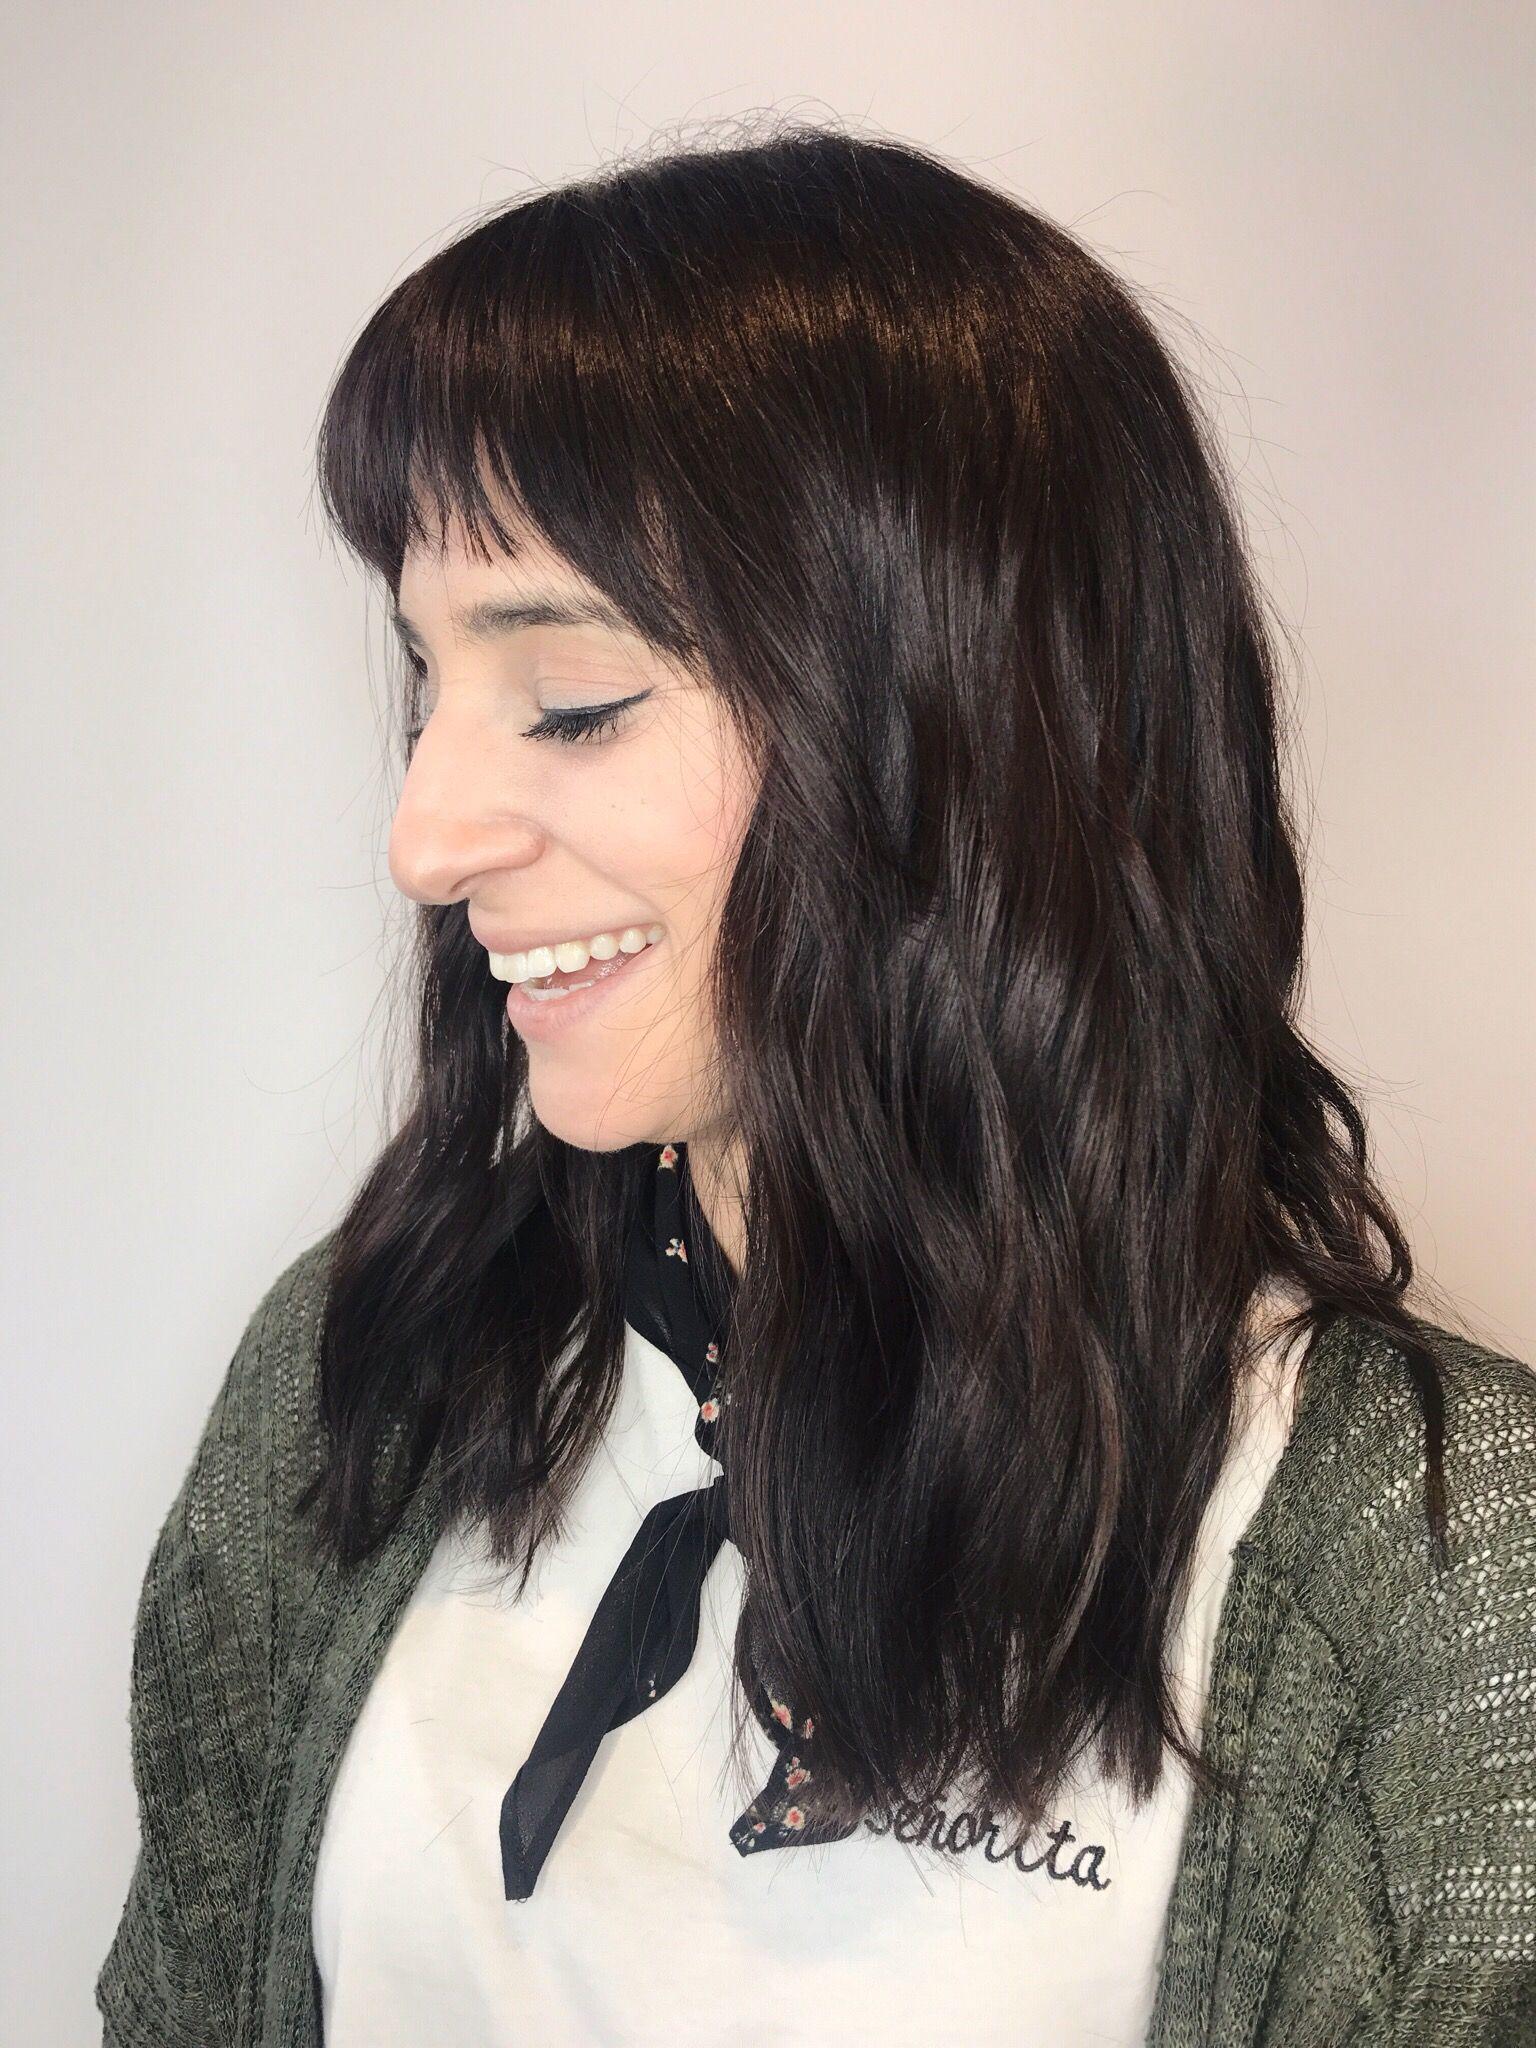 dark hair, dark wavy hair, dark hair with bangs, bangs, haircut